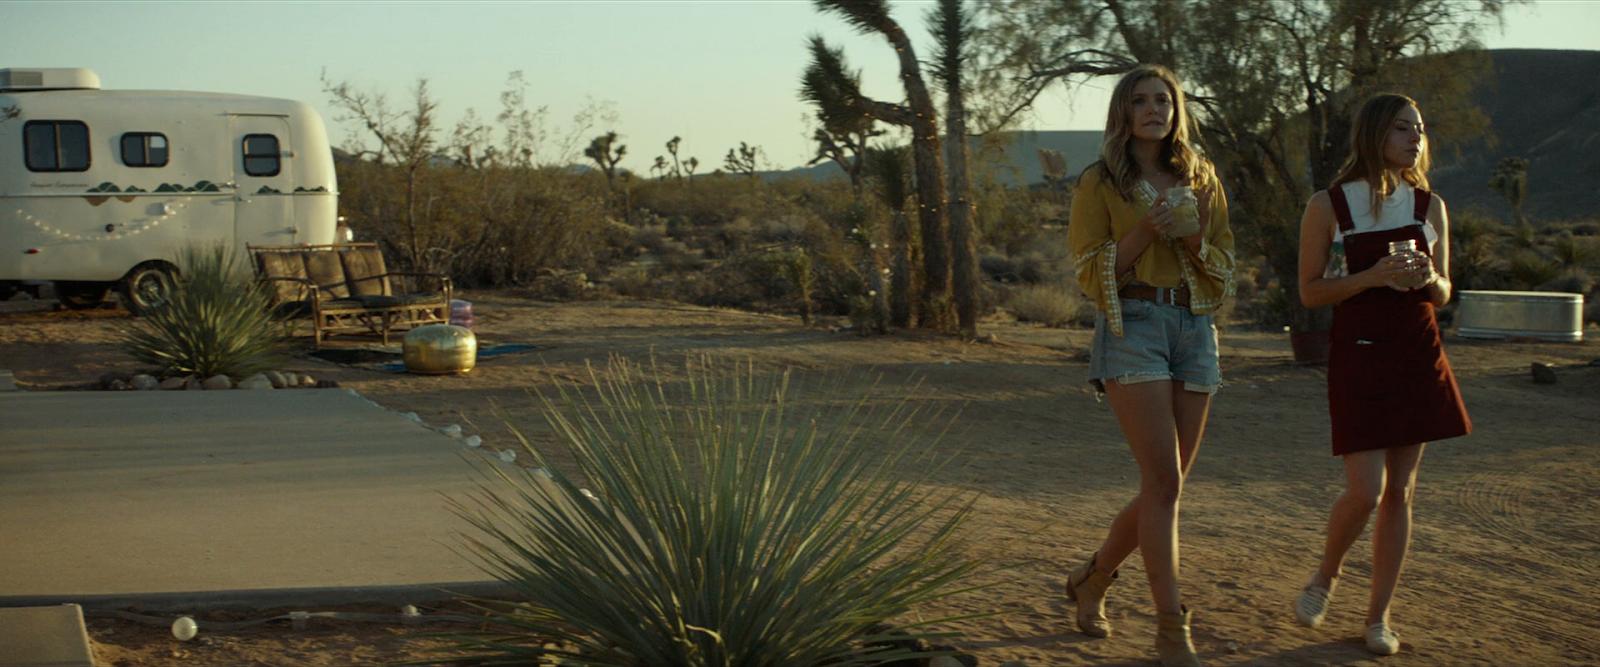 Ingrid Goes West (2017) BRRip 1080p Latino-Castellano-Ingles captura 3